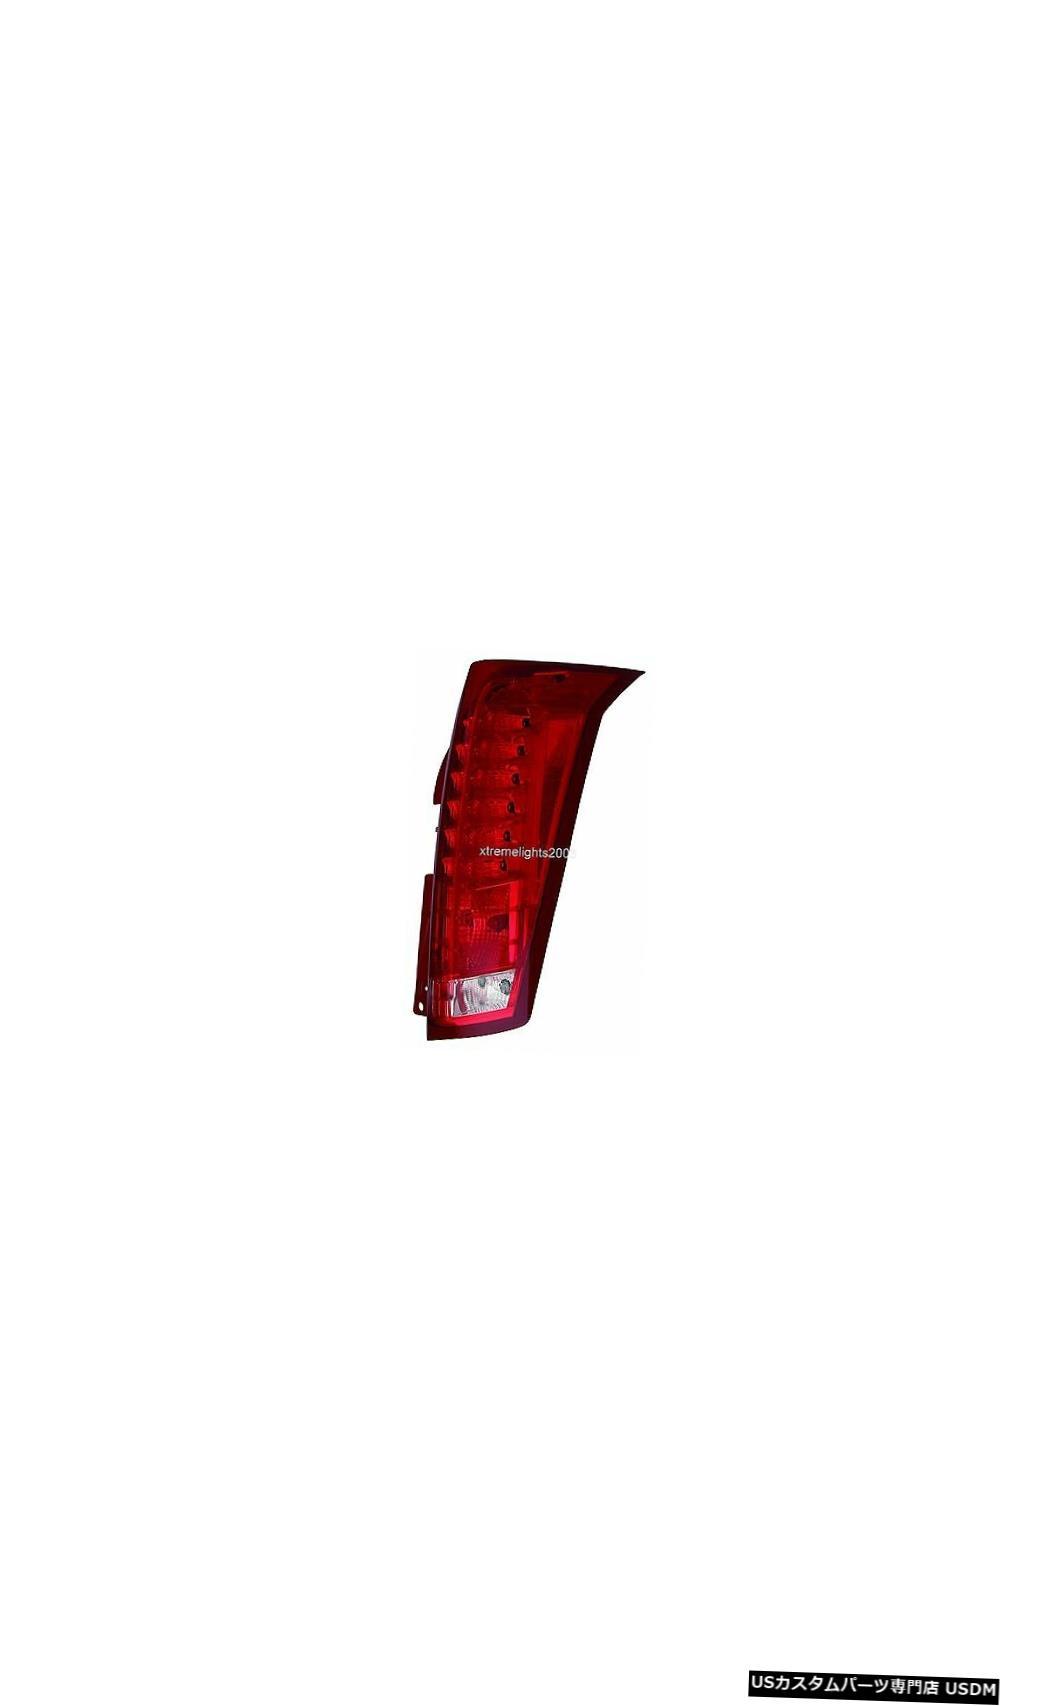 Tail light キャデラックSRX 2010-2016右パッセンジャーテールライトリアランプテールライトNEW CADILLAC SRX 2010-2016 RIGHT PASSENGER TAIL LIGHT REAR LAMP TAILLIGHT NEW